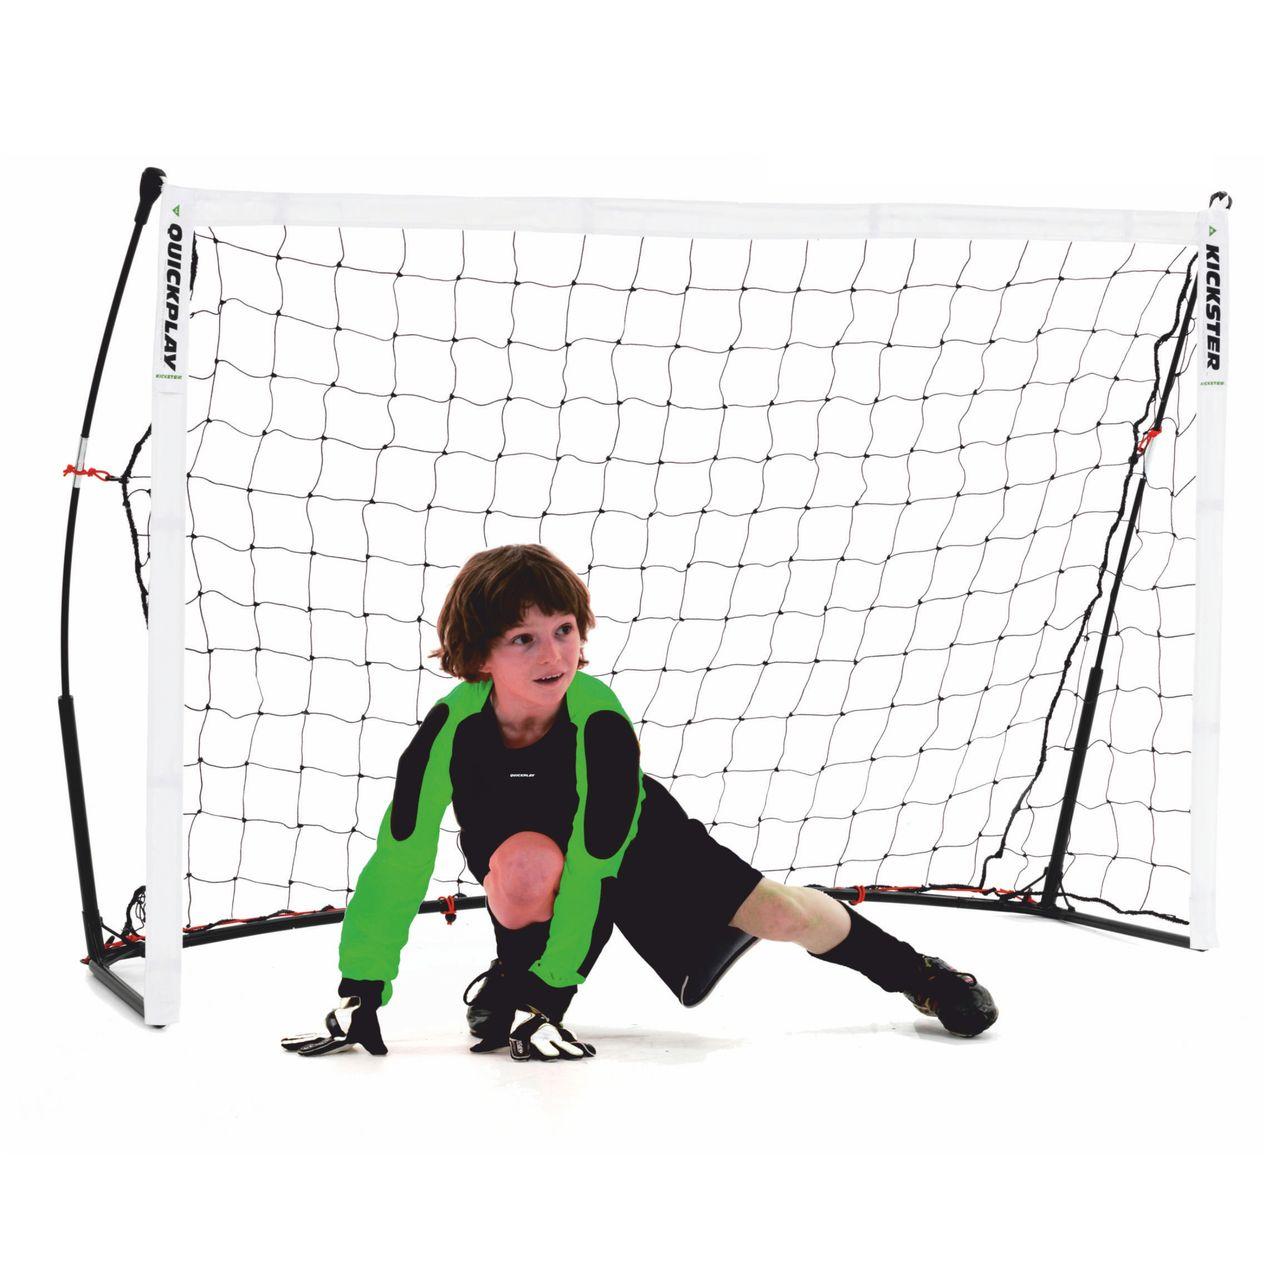 Quick Play - Kickster 1.82m x 1.21m - Soccer goal